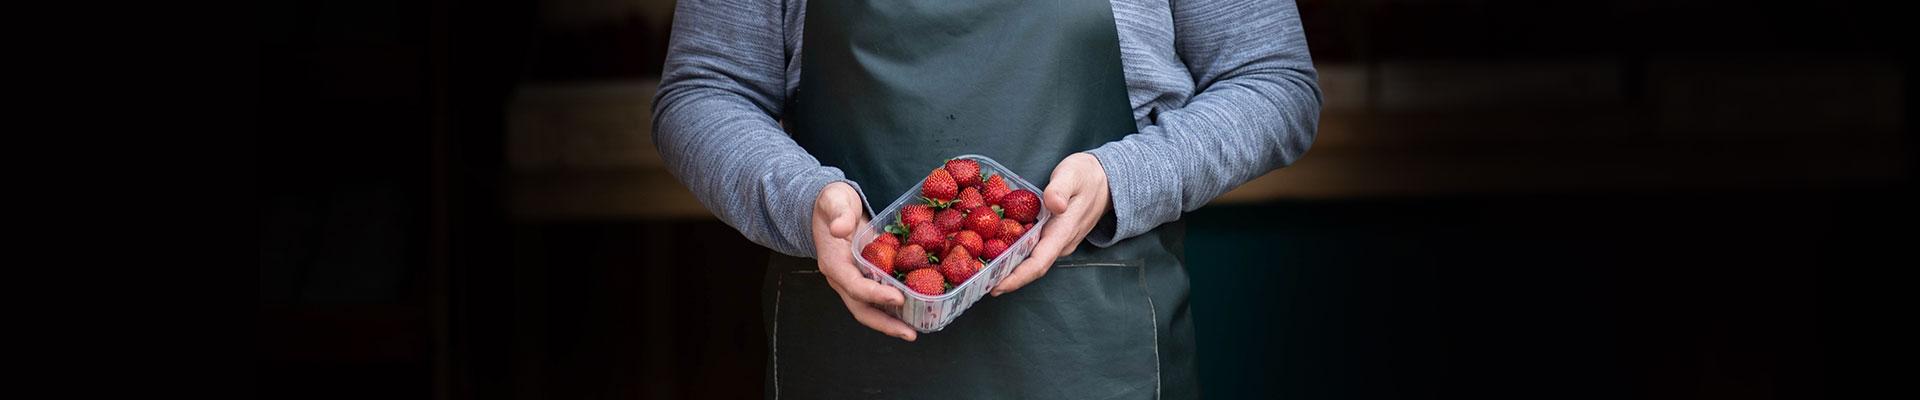 mathio-fraise-main